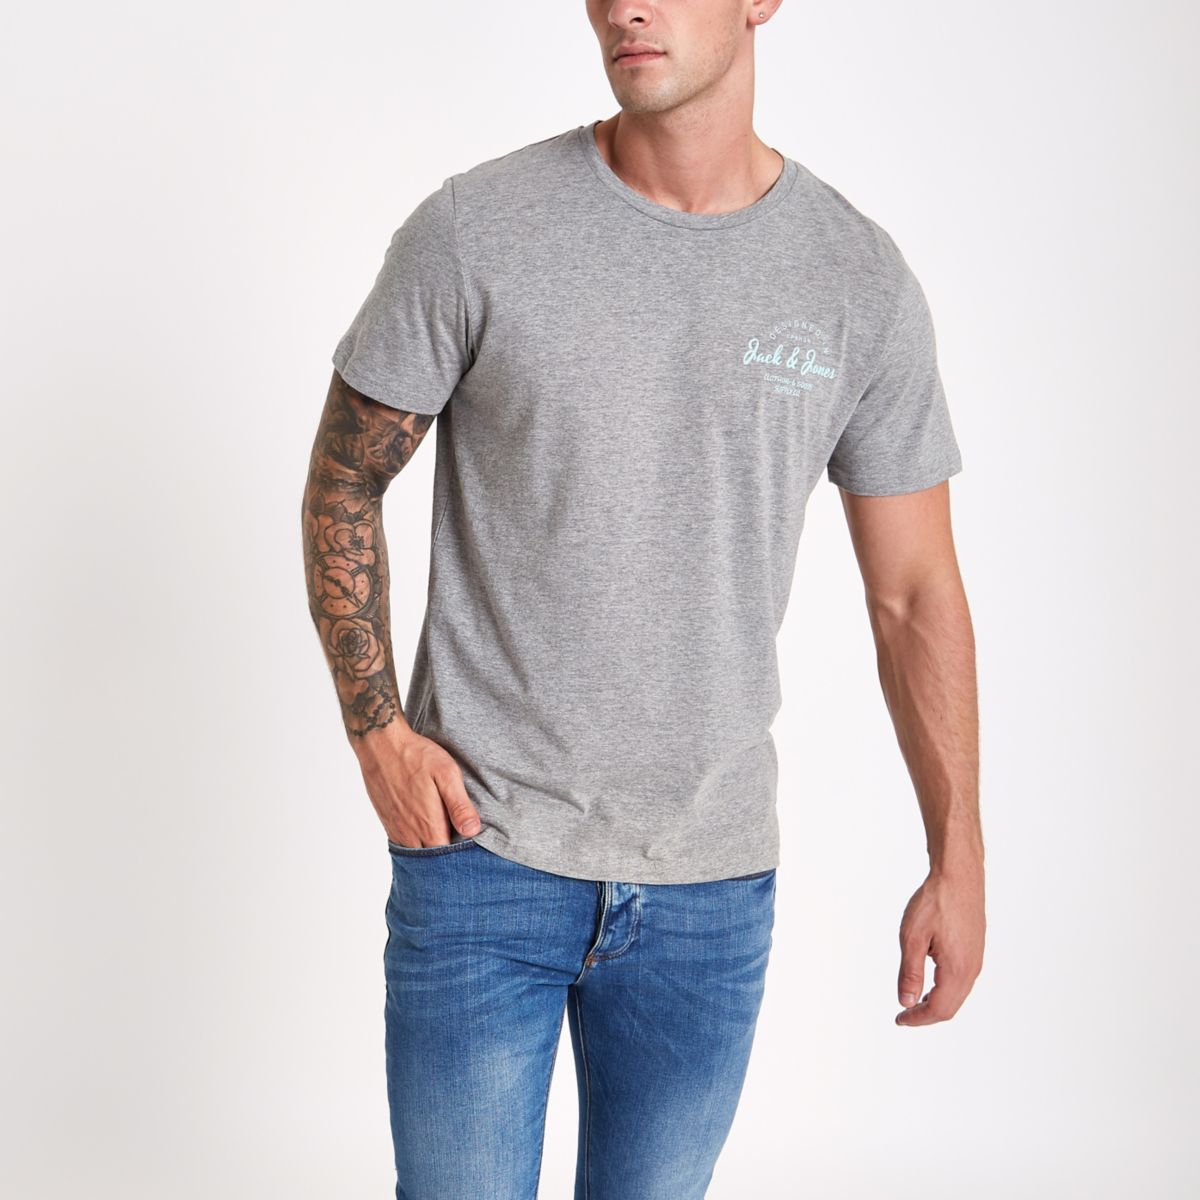 Jack & Jones Originals grey T-shirt